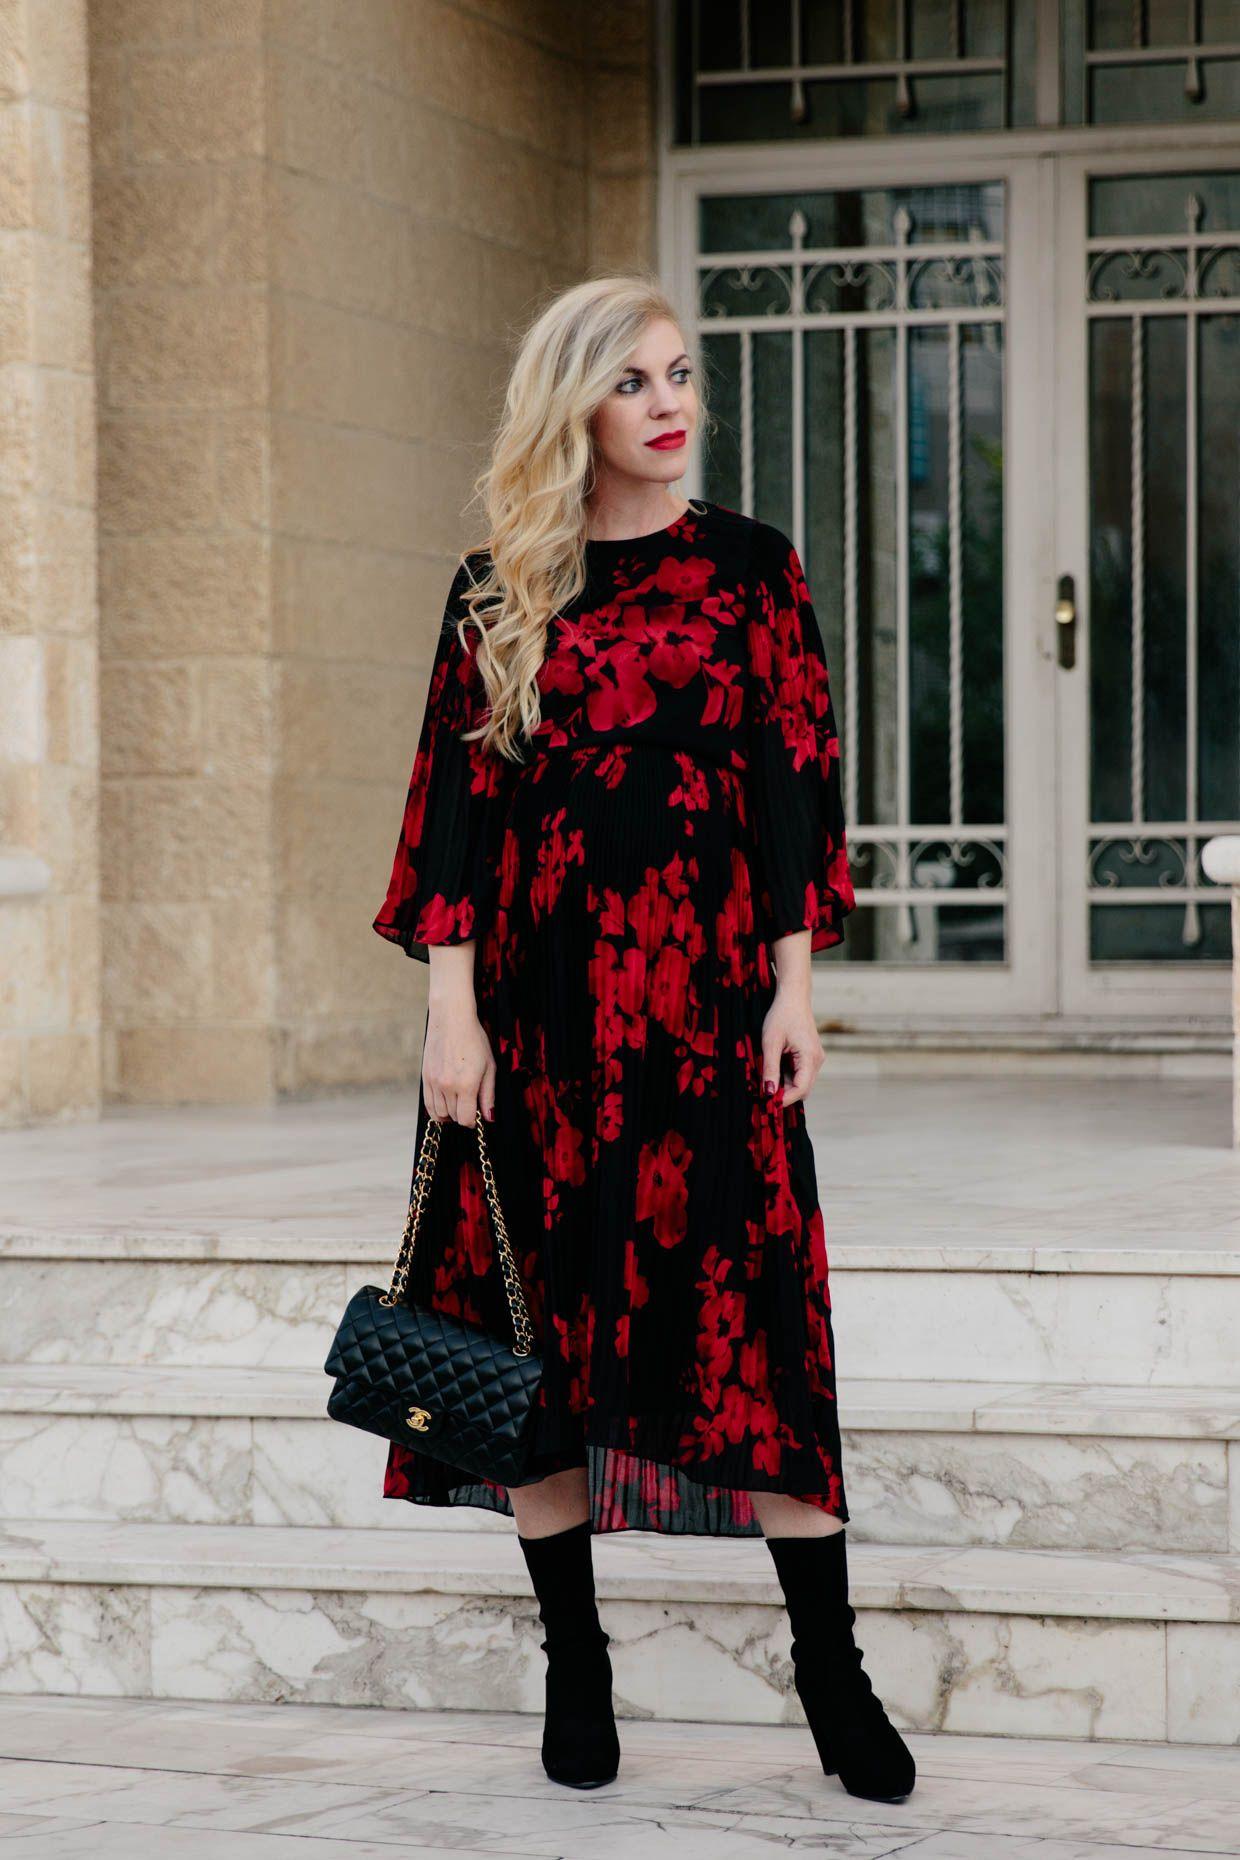 Dark Romance Floral Midi Dress With Sock Boots Floral Midi Dress Dresses Midi Dress